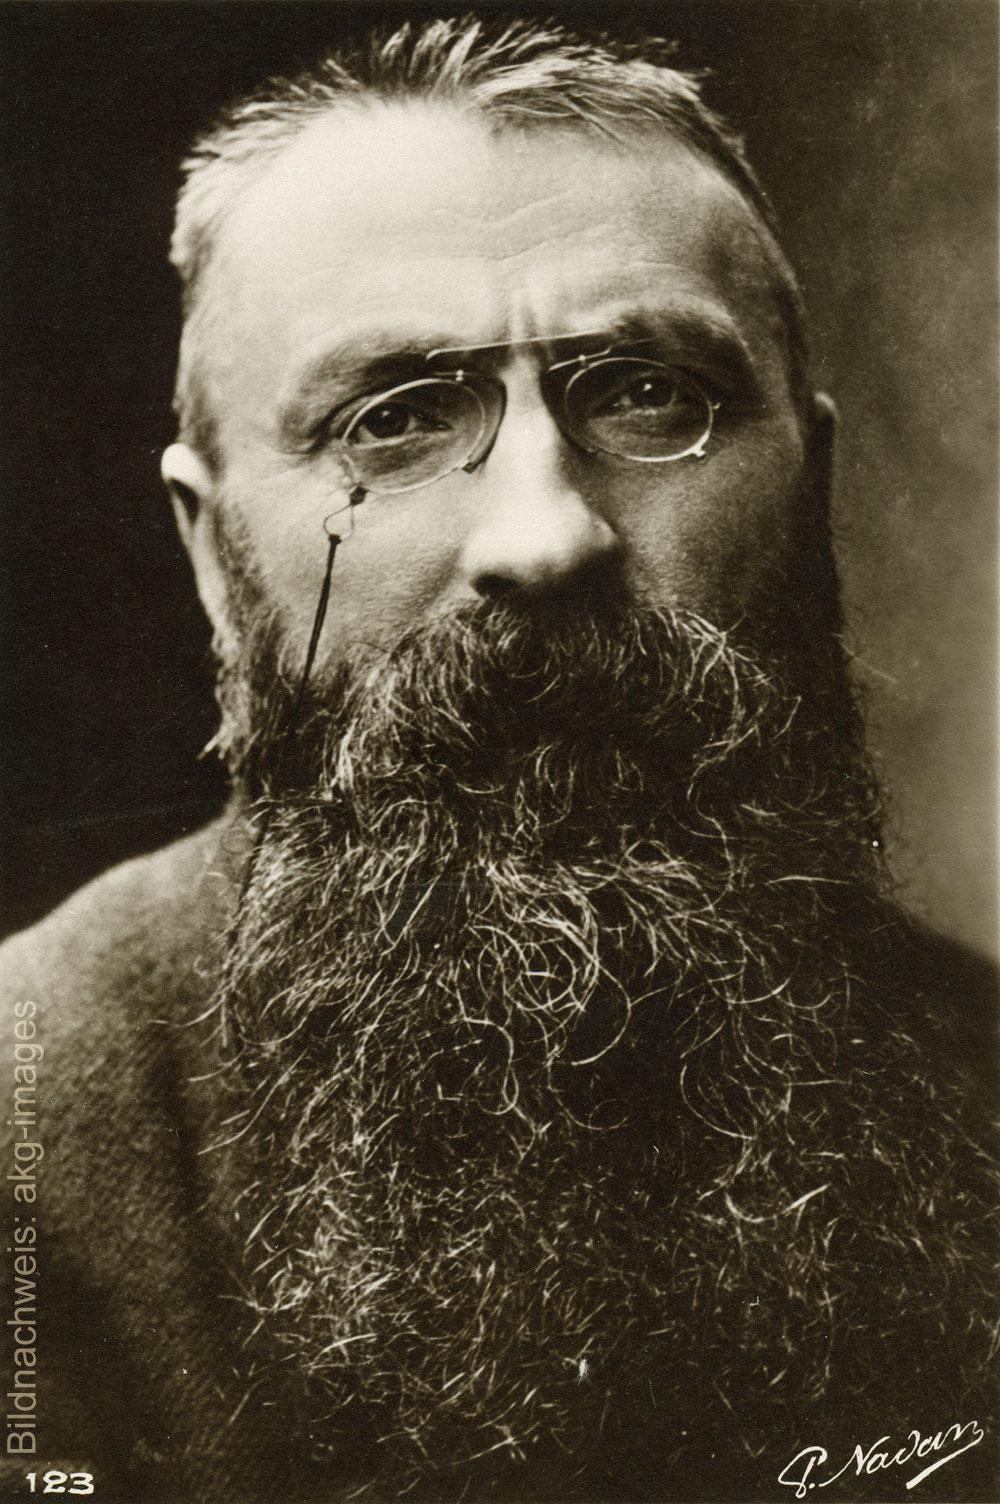 Porträt des Künstlers Auguste Rodin